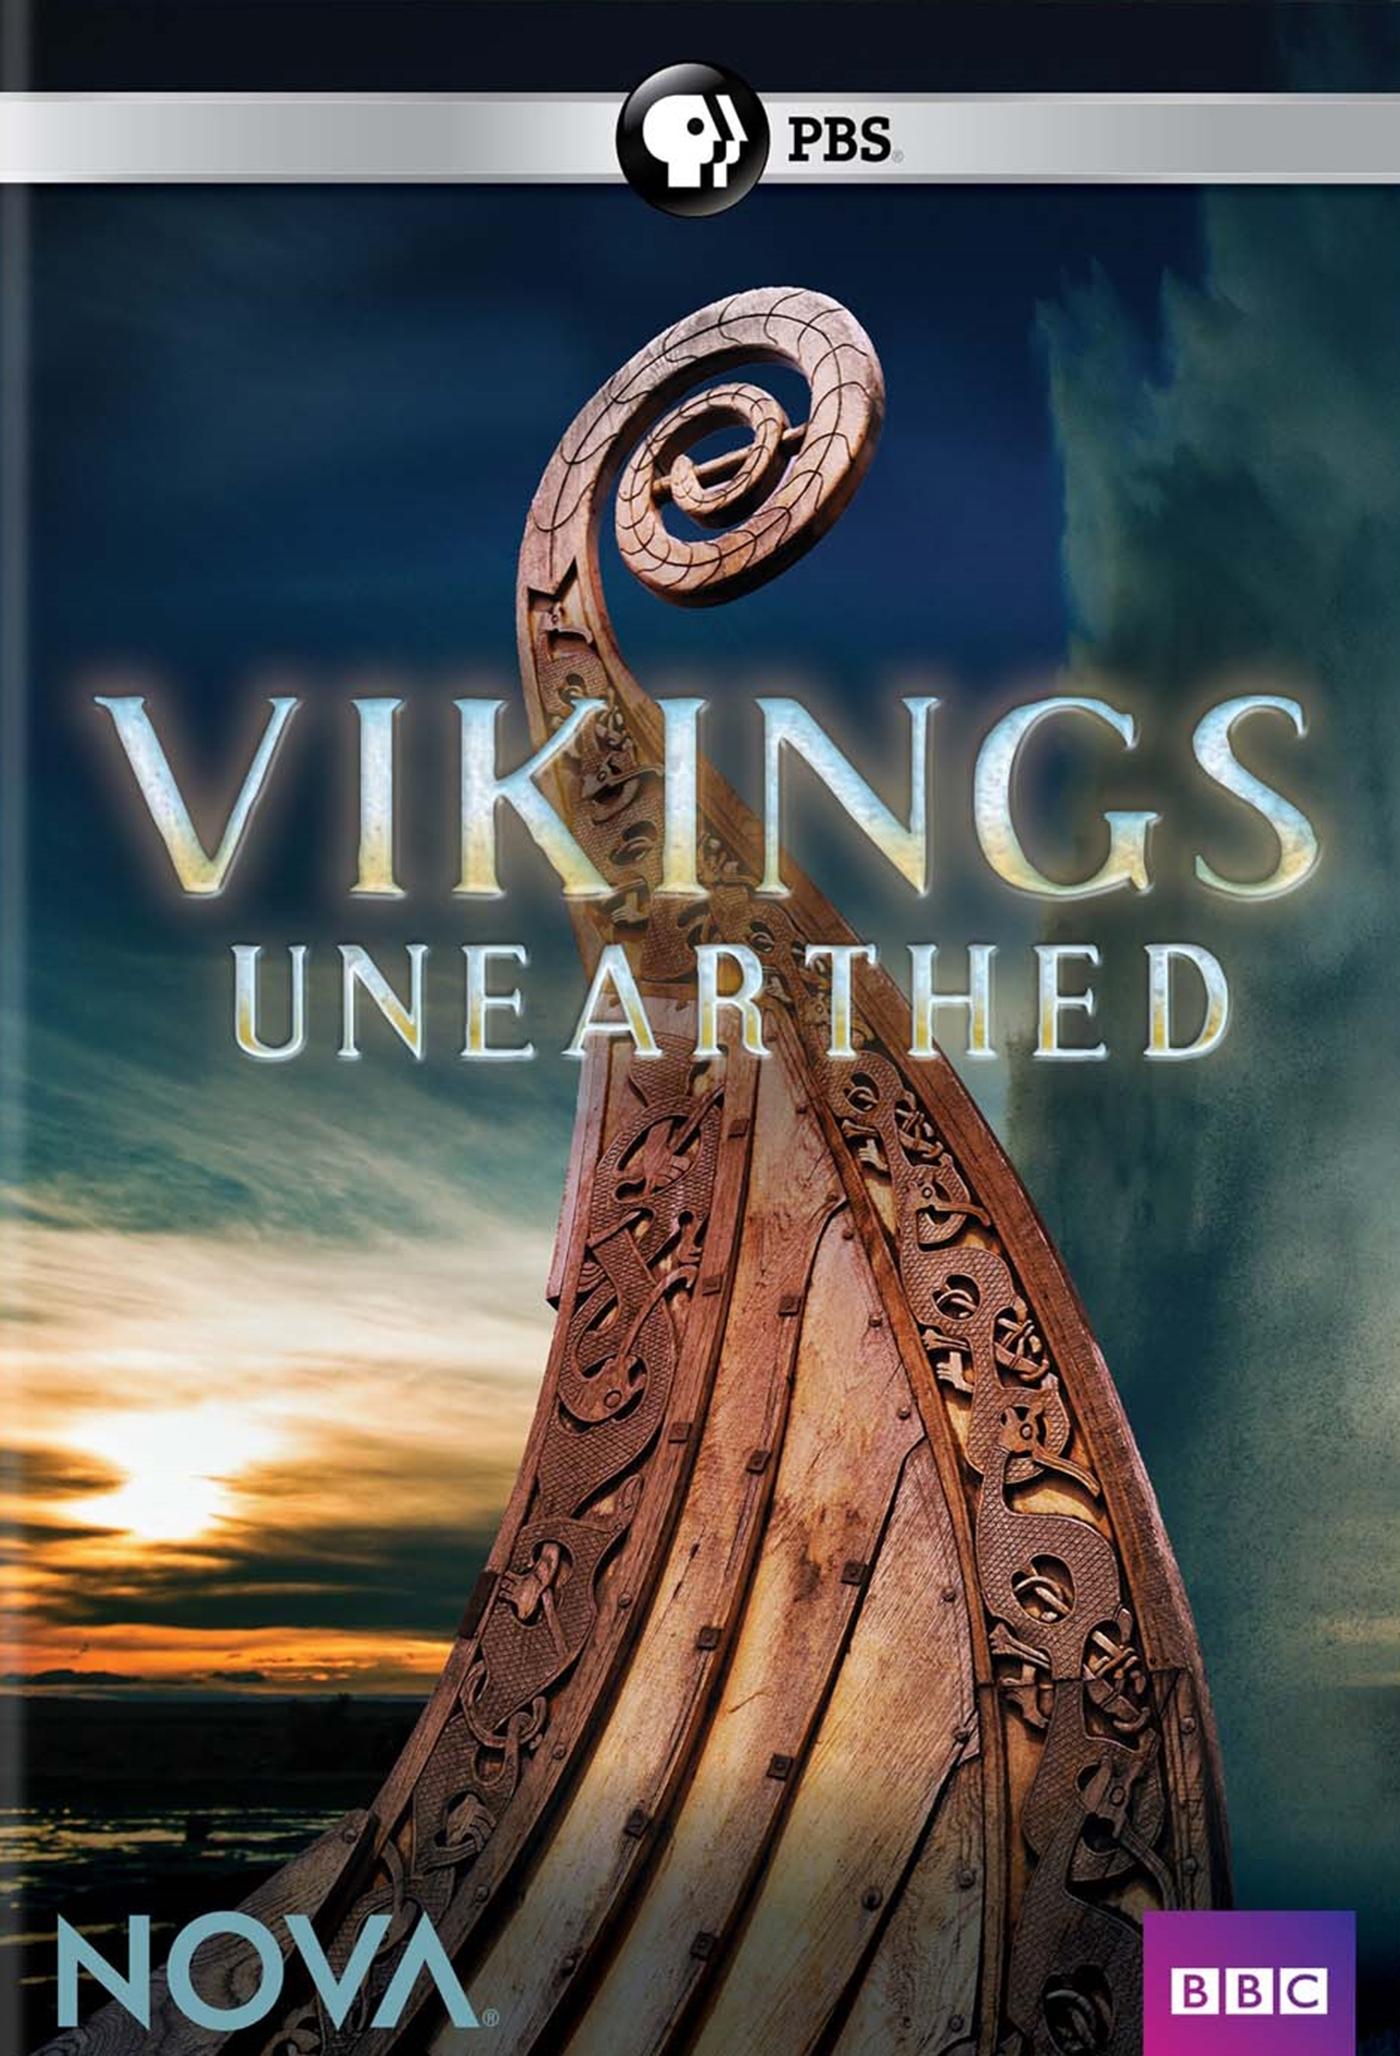 Nova: Vikings Unearthed (dvd) 30952544